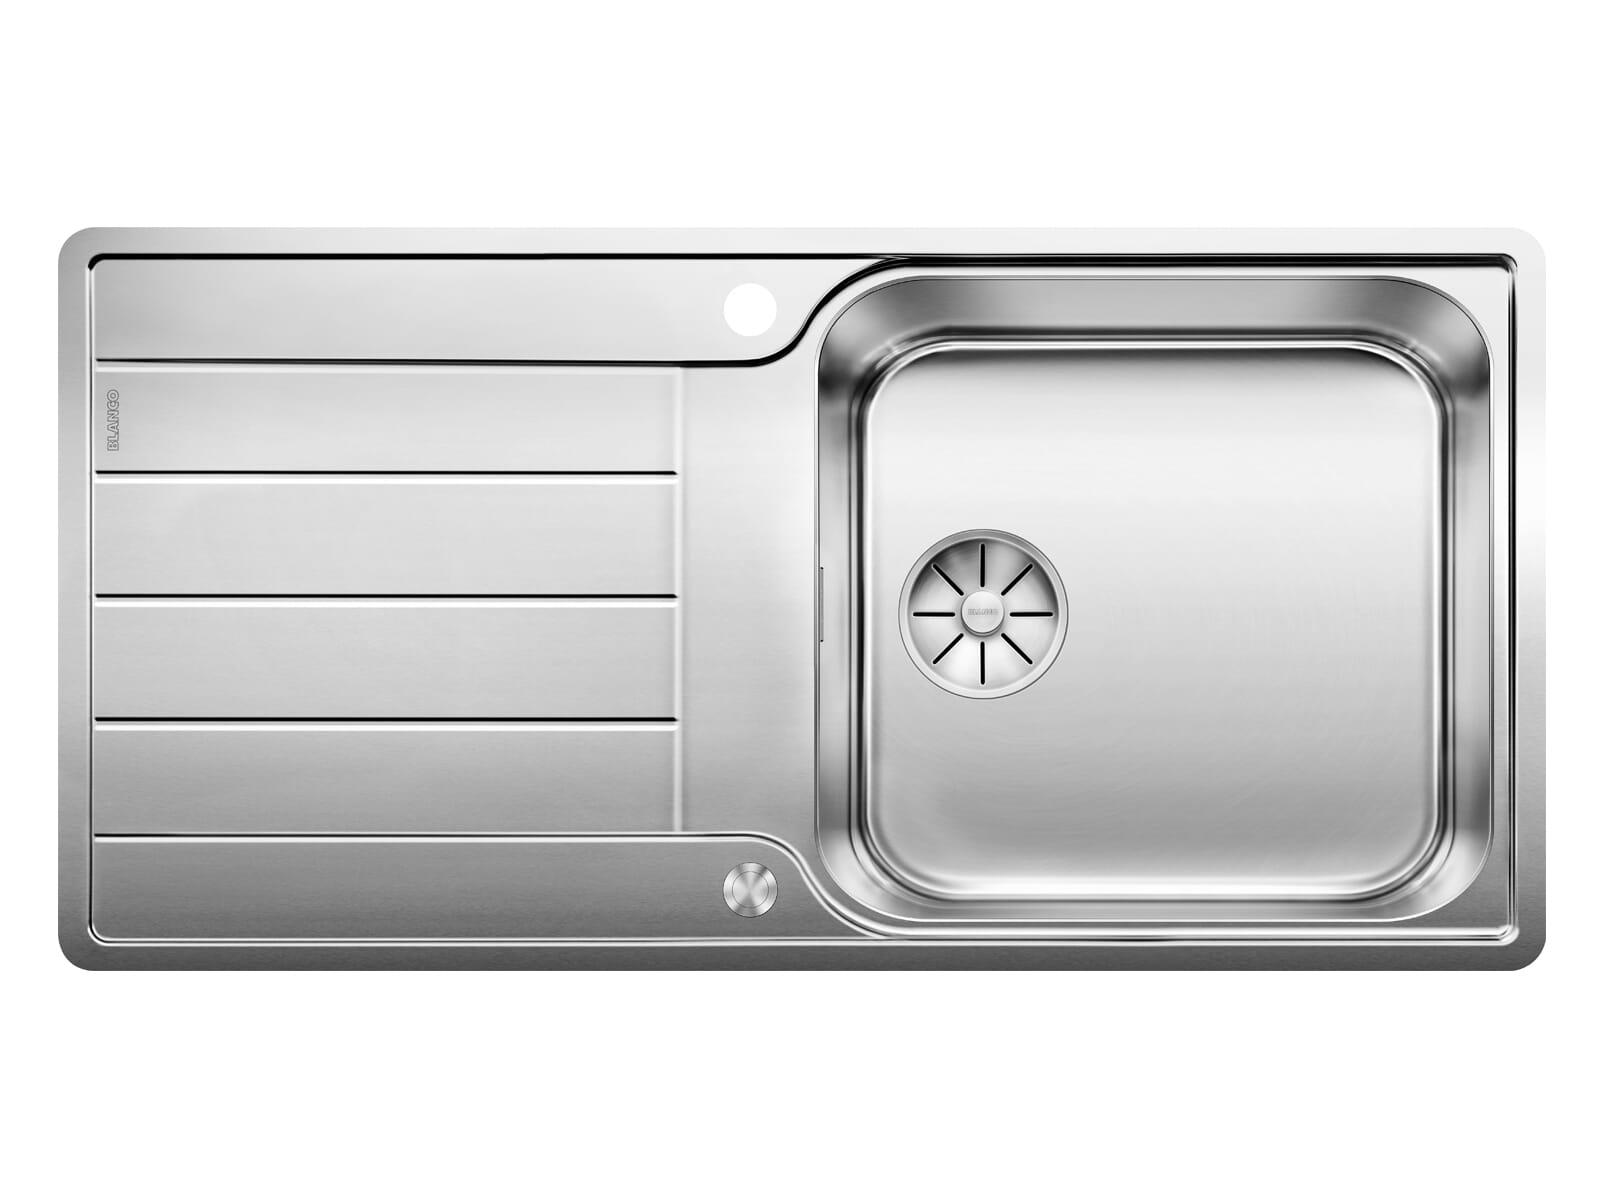 Blanco Classimo XL 6 S-IF Edelstahlspüle Bürstfinish 525 327